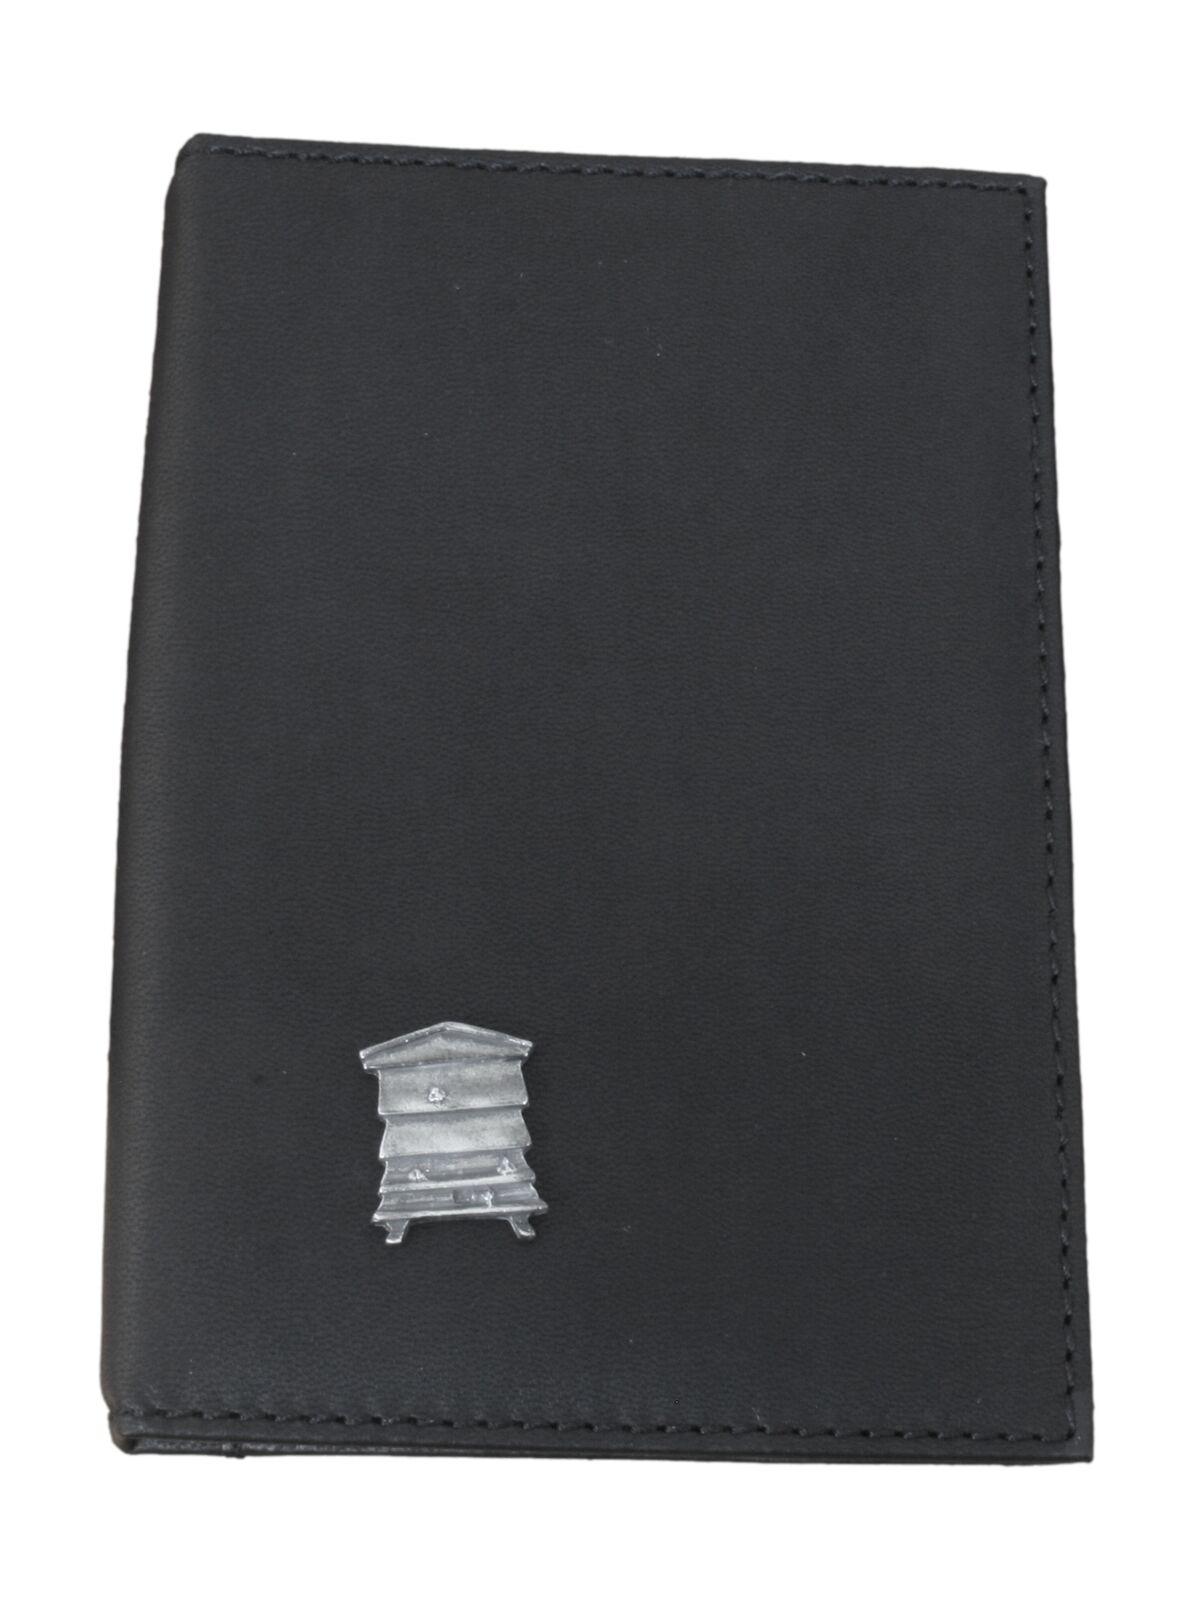 Bee Hive Black Leather Shotgun/Firearms Certificate Holder 29